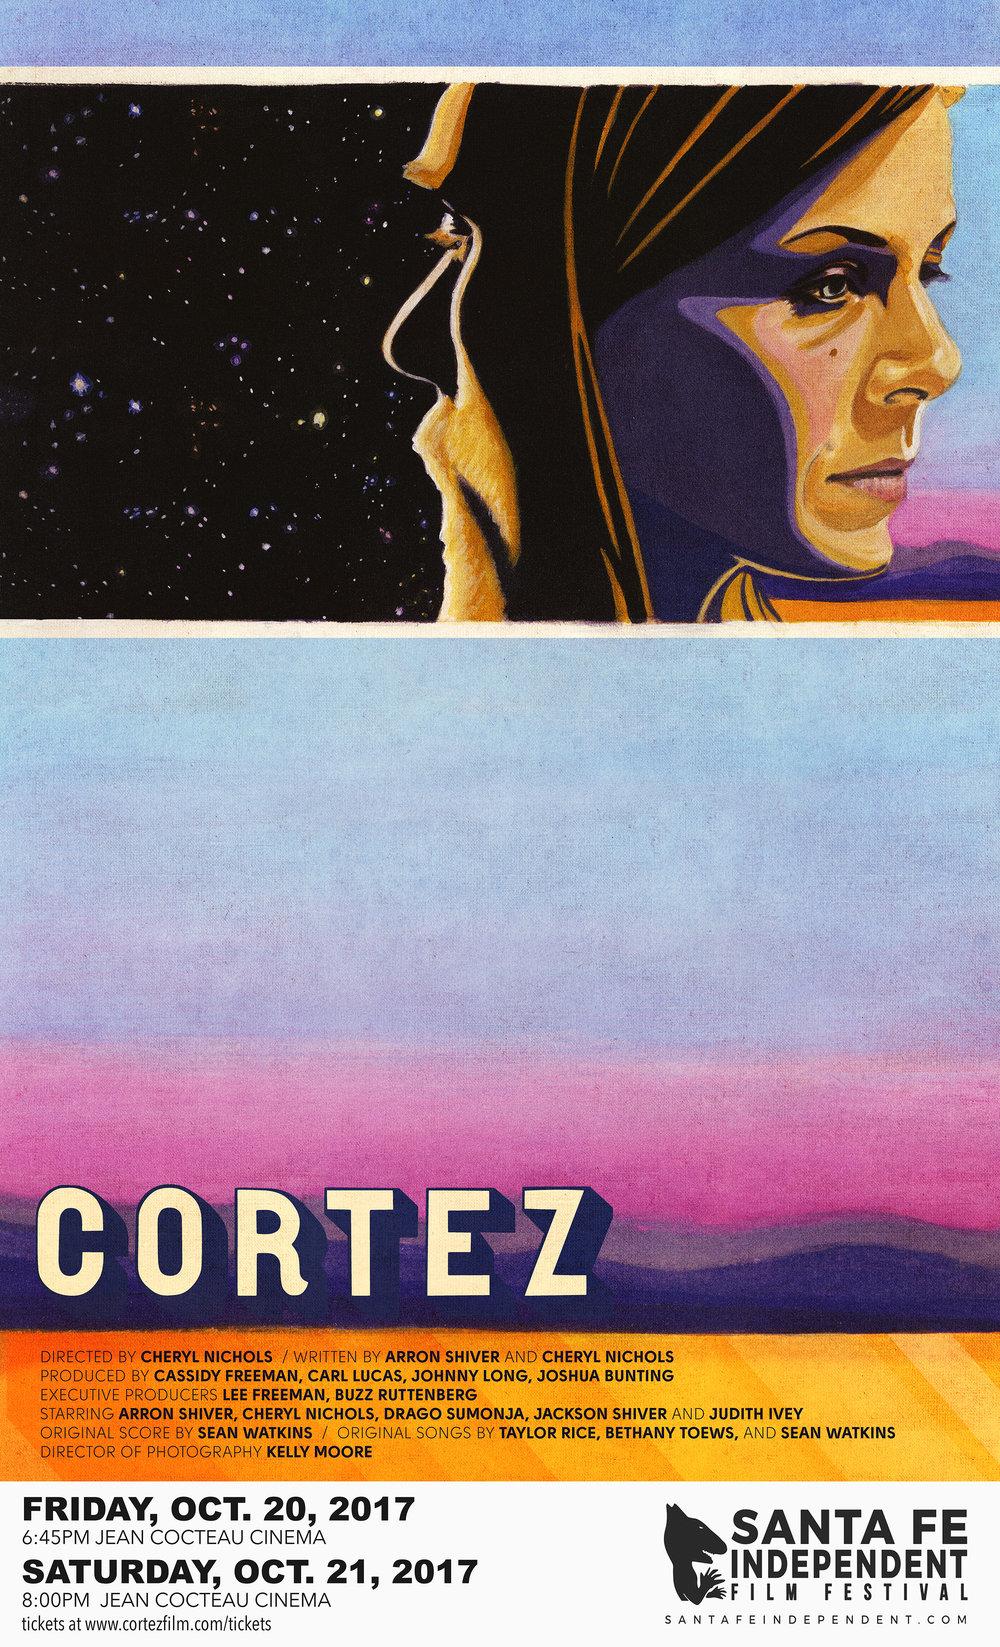 CortezB3-2-SANTAFE.jpg